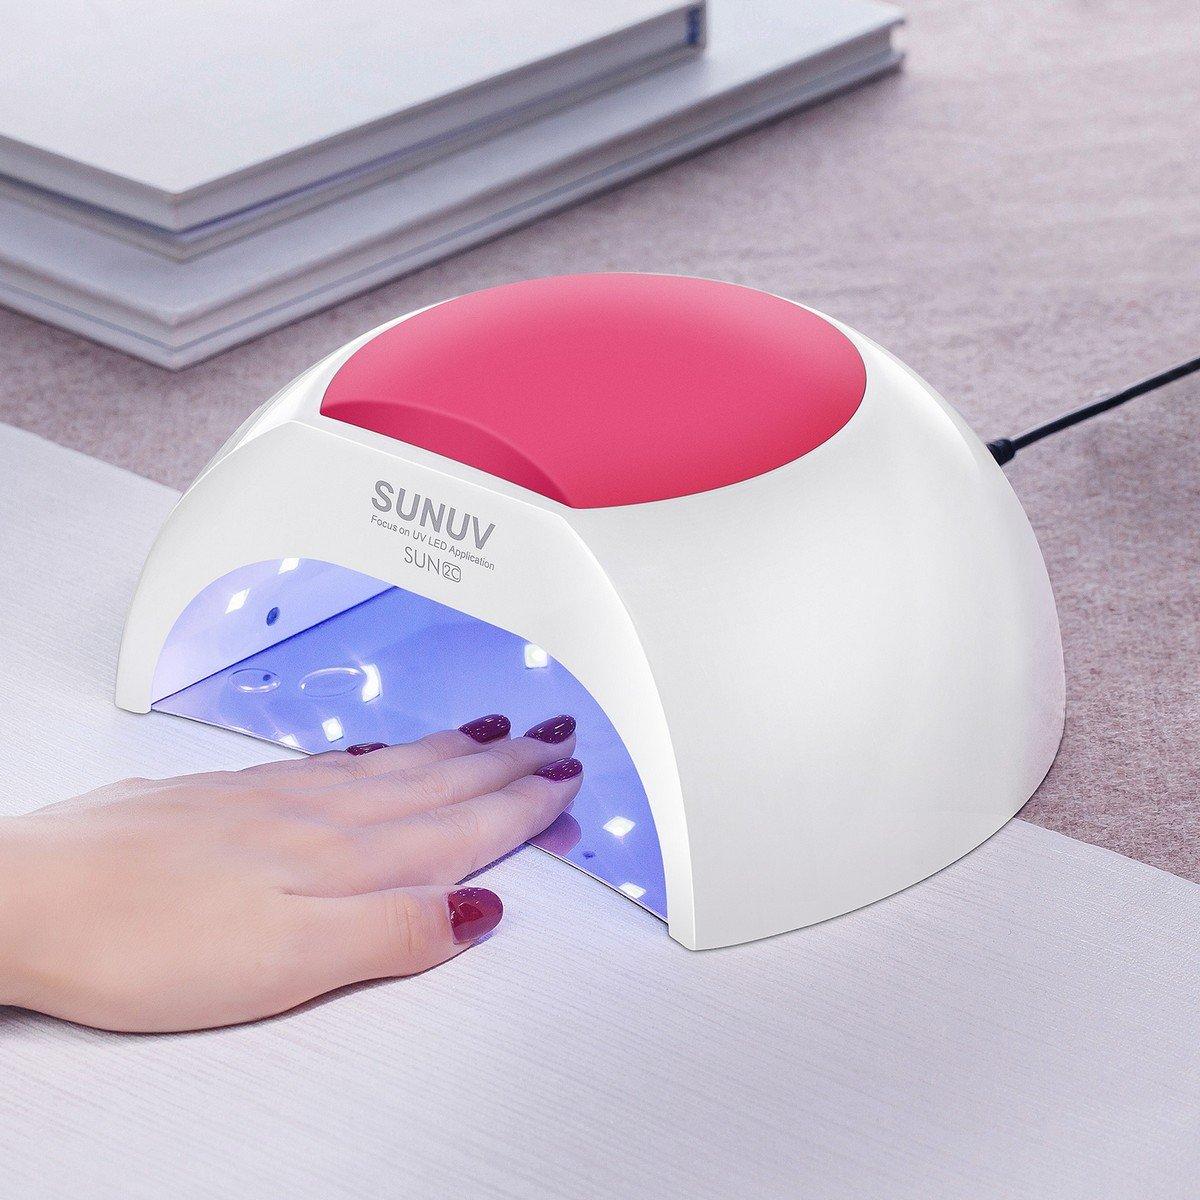 Gel UV Nail Lamp SUNUV 48W UV LED Nail Dryer Light for Gel Nails Polish Manicure Professional Salon